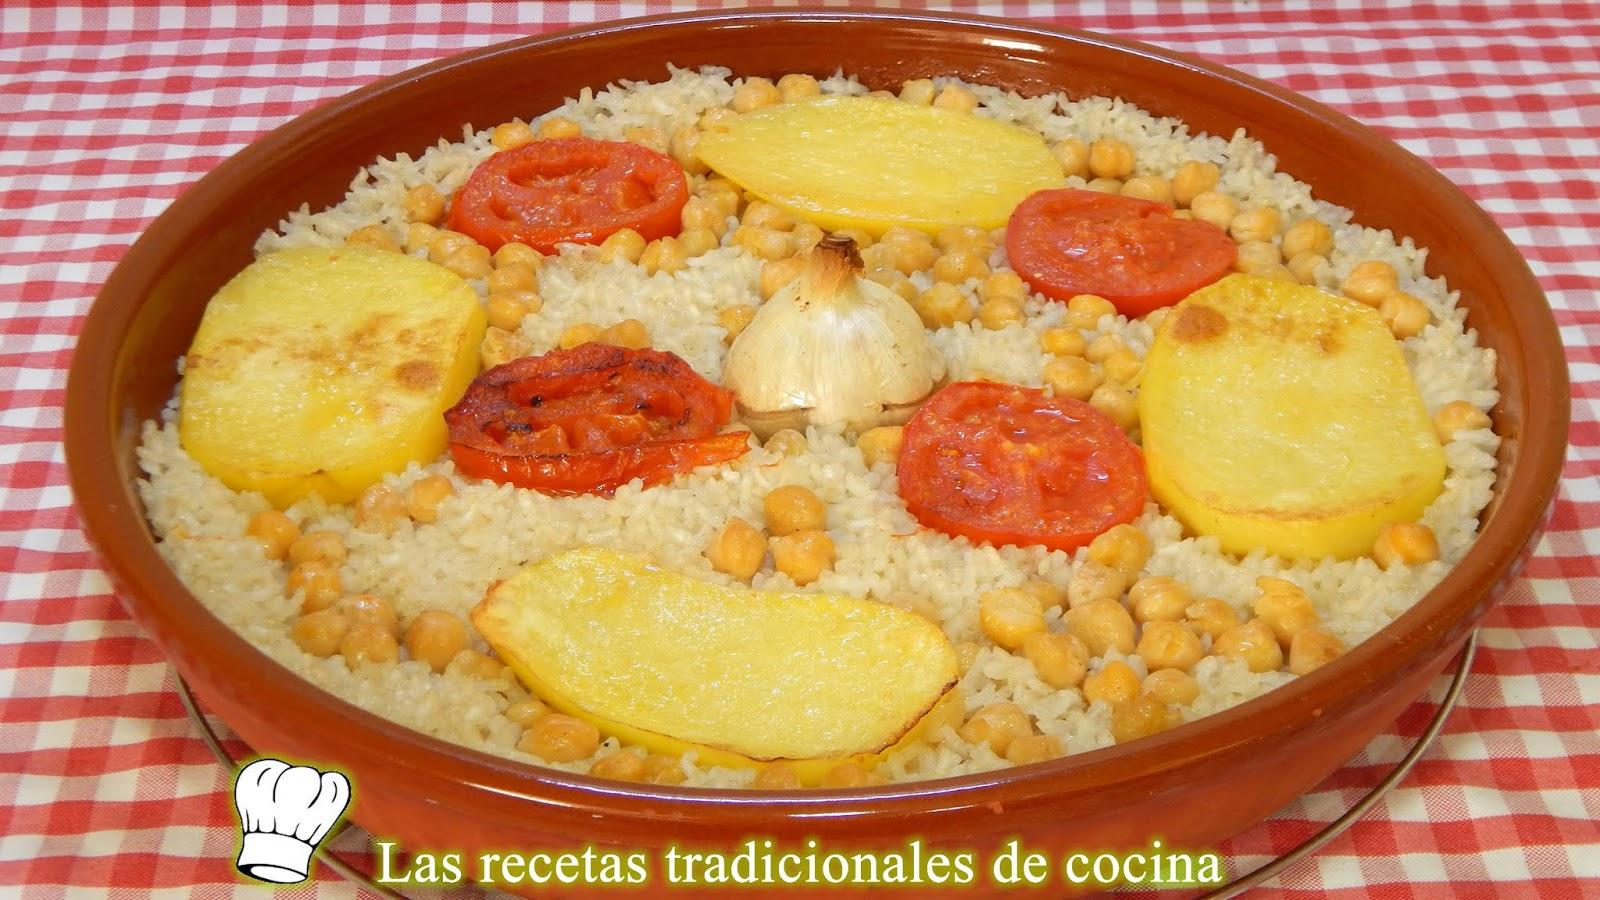 Recetas De Cocina Con Sabor Tradicional Receta Fácil De